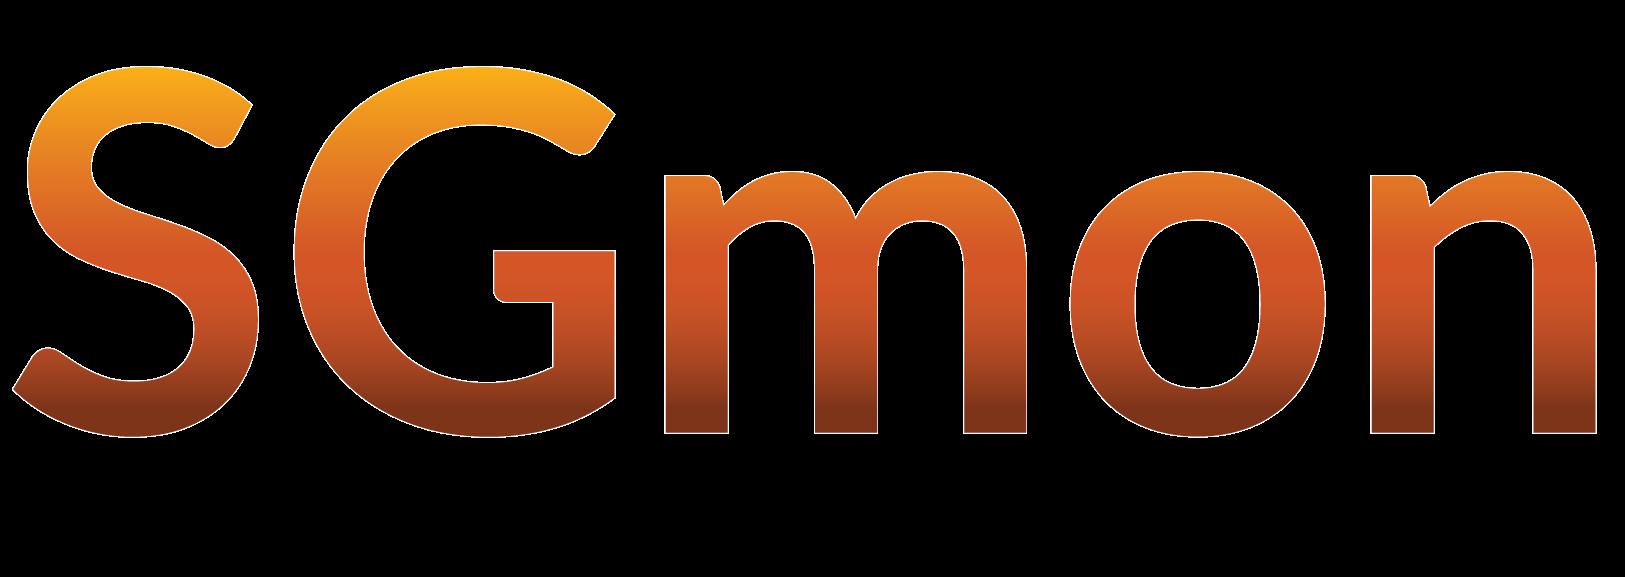 SGmon logo